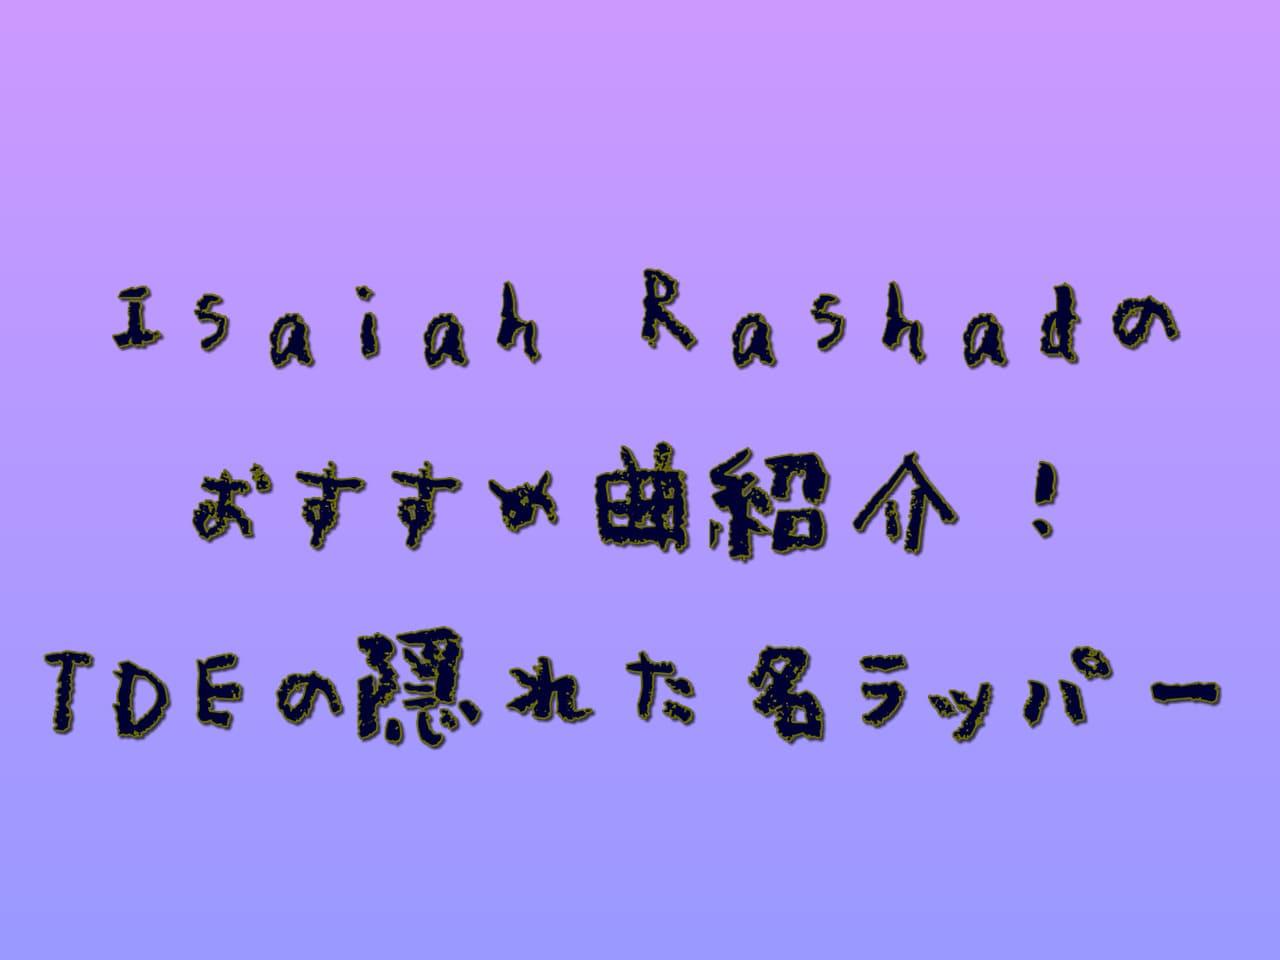 Isaiah Rashad(アイザイア・ラシャド)のおすすめ曲【TDEの隠れた名ラッパー】